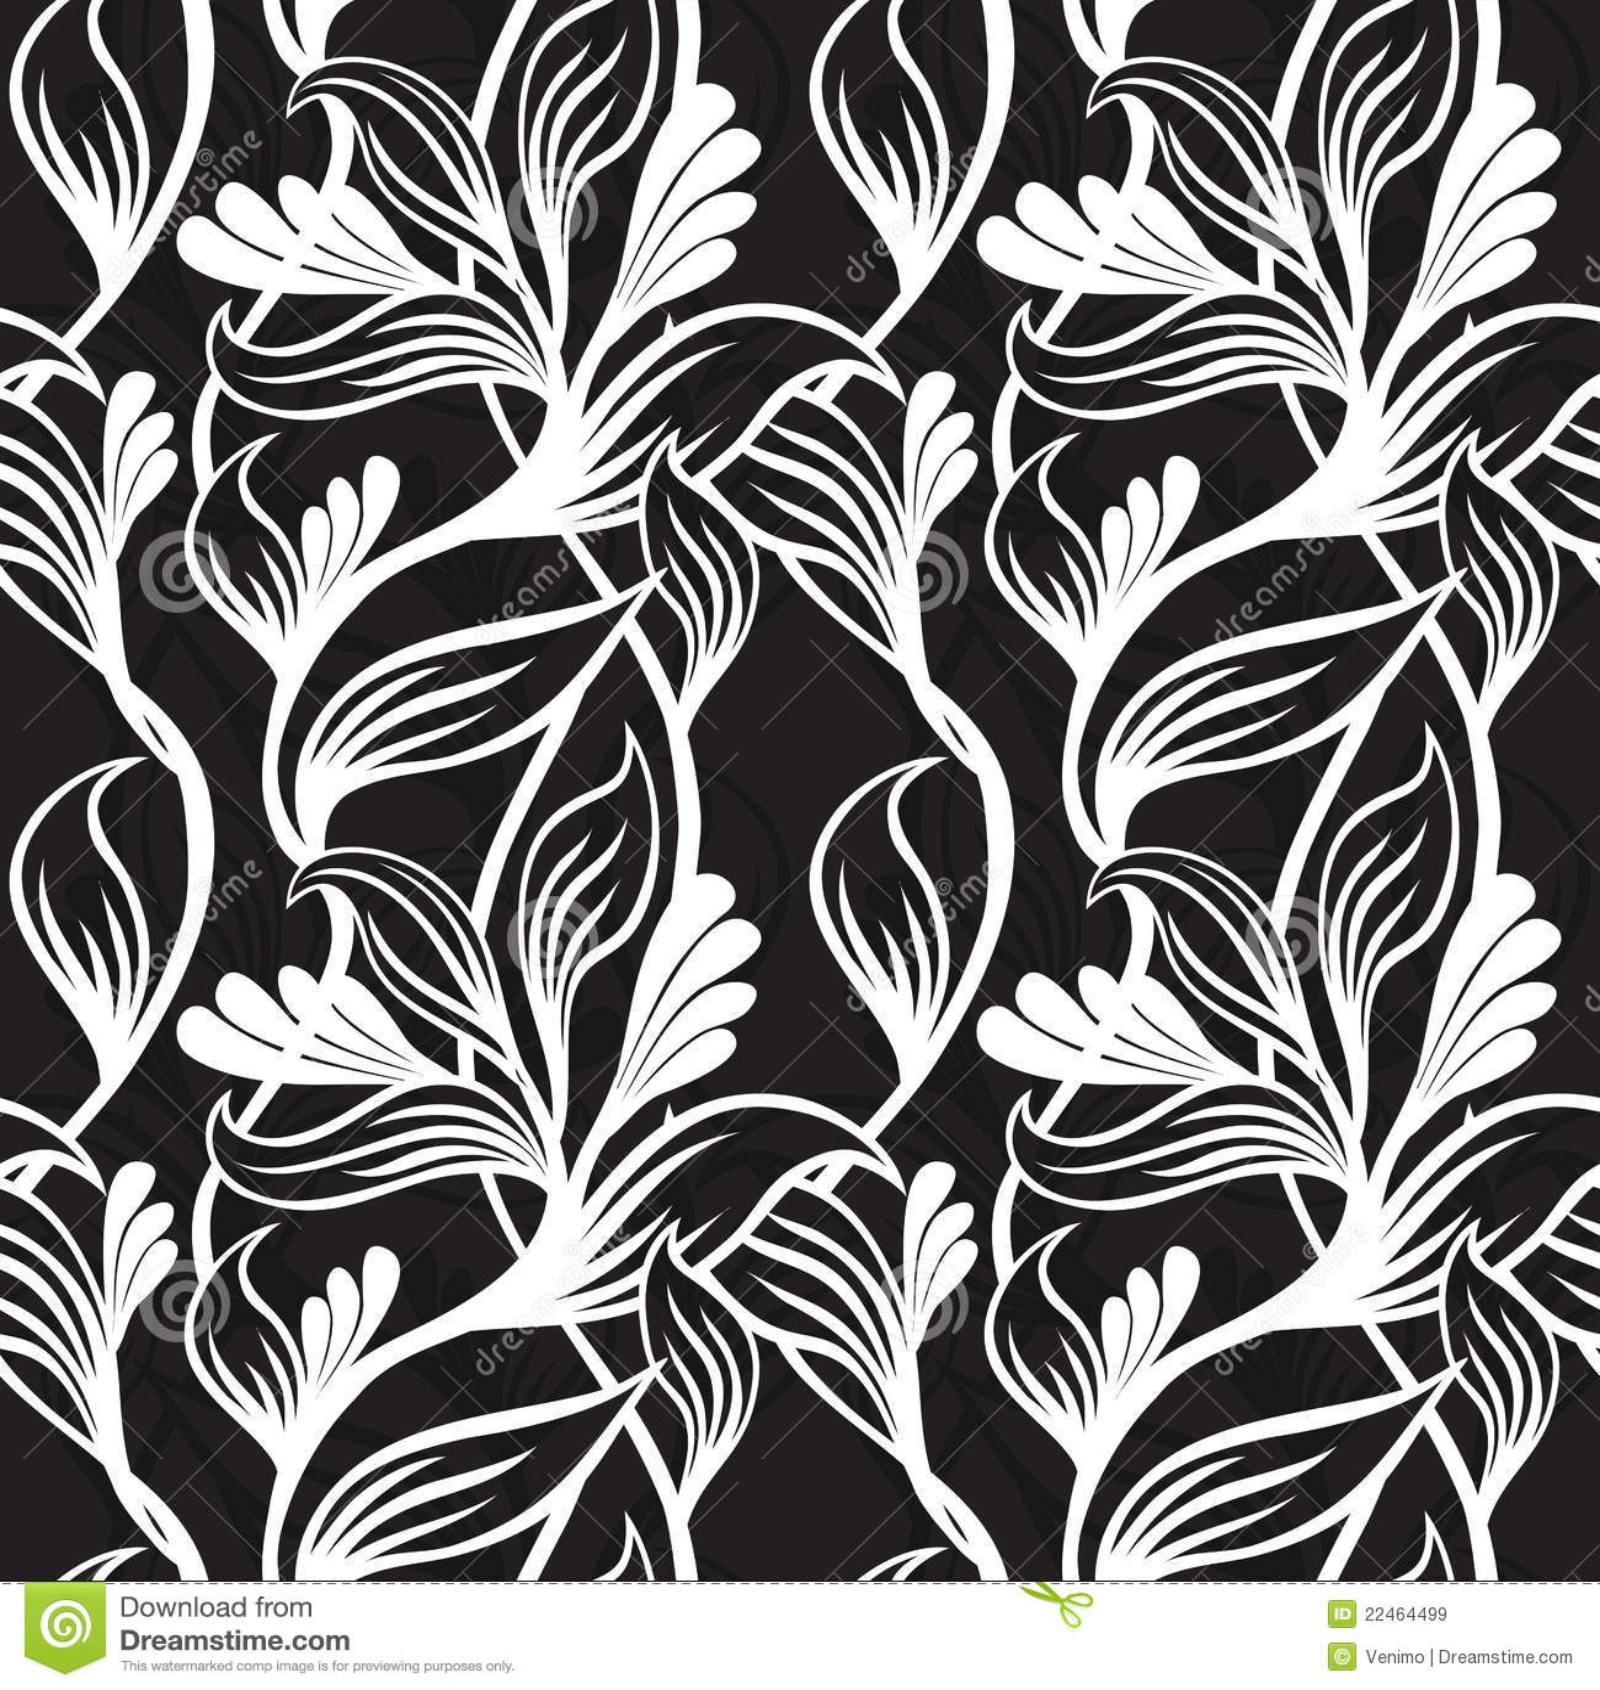 Black Flower On White Background Royalty Free Stock: Black And White Floral Background Stock Vector